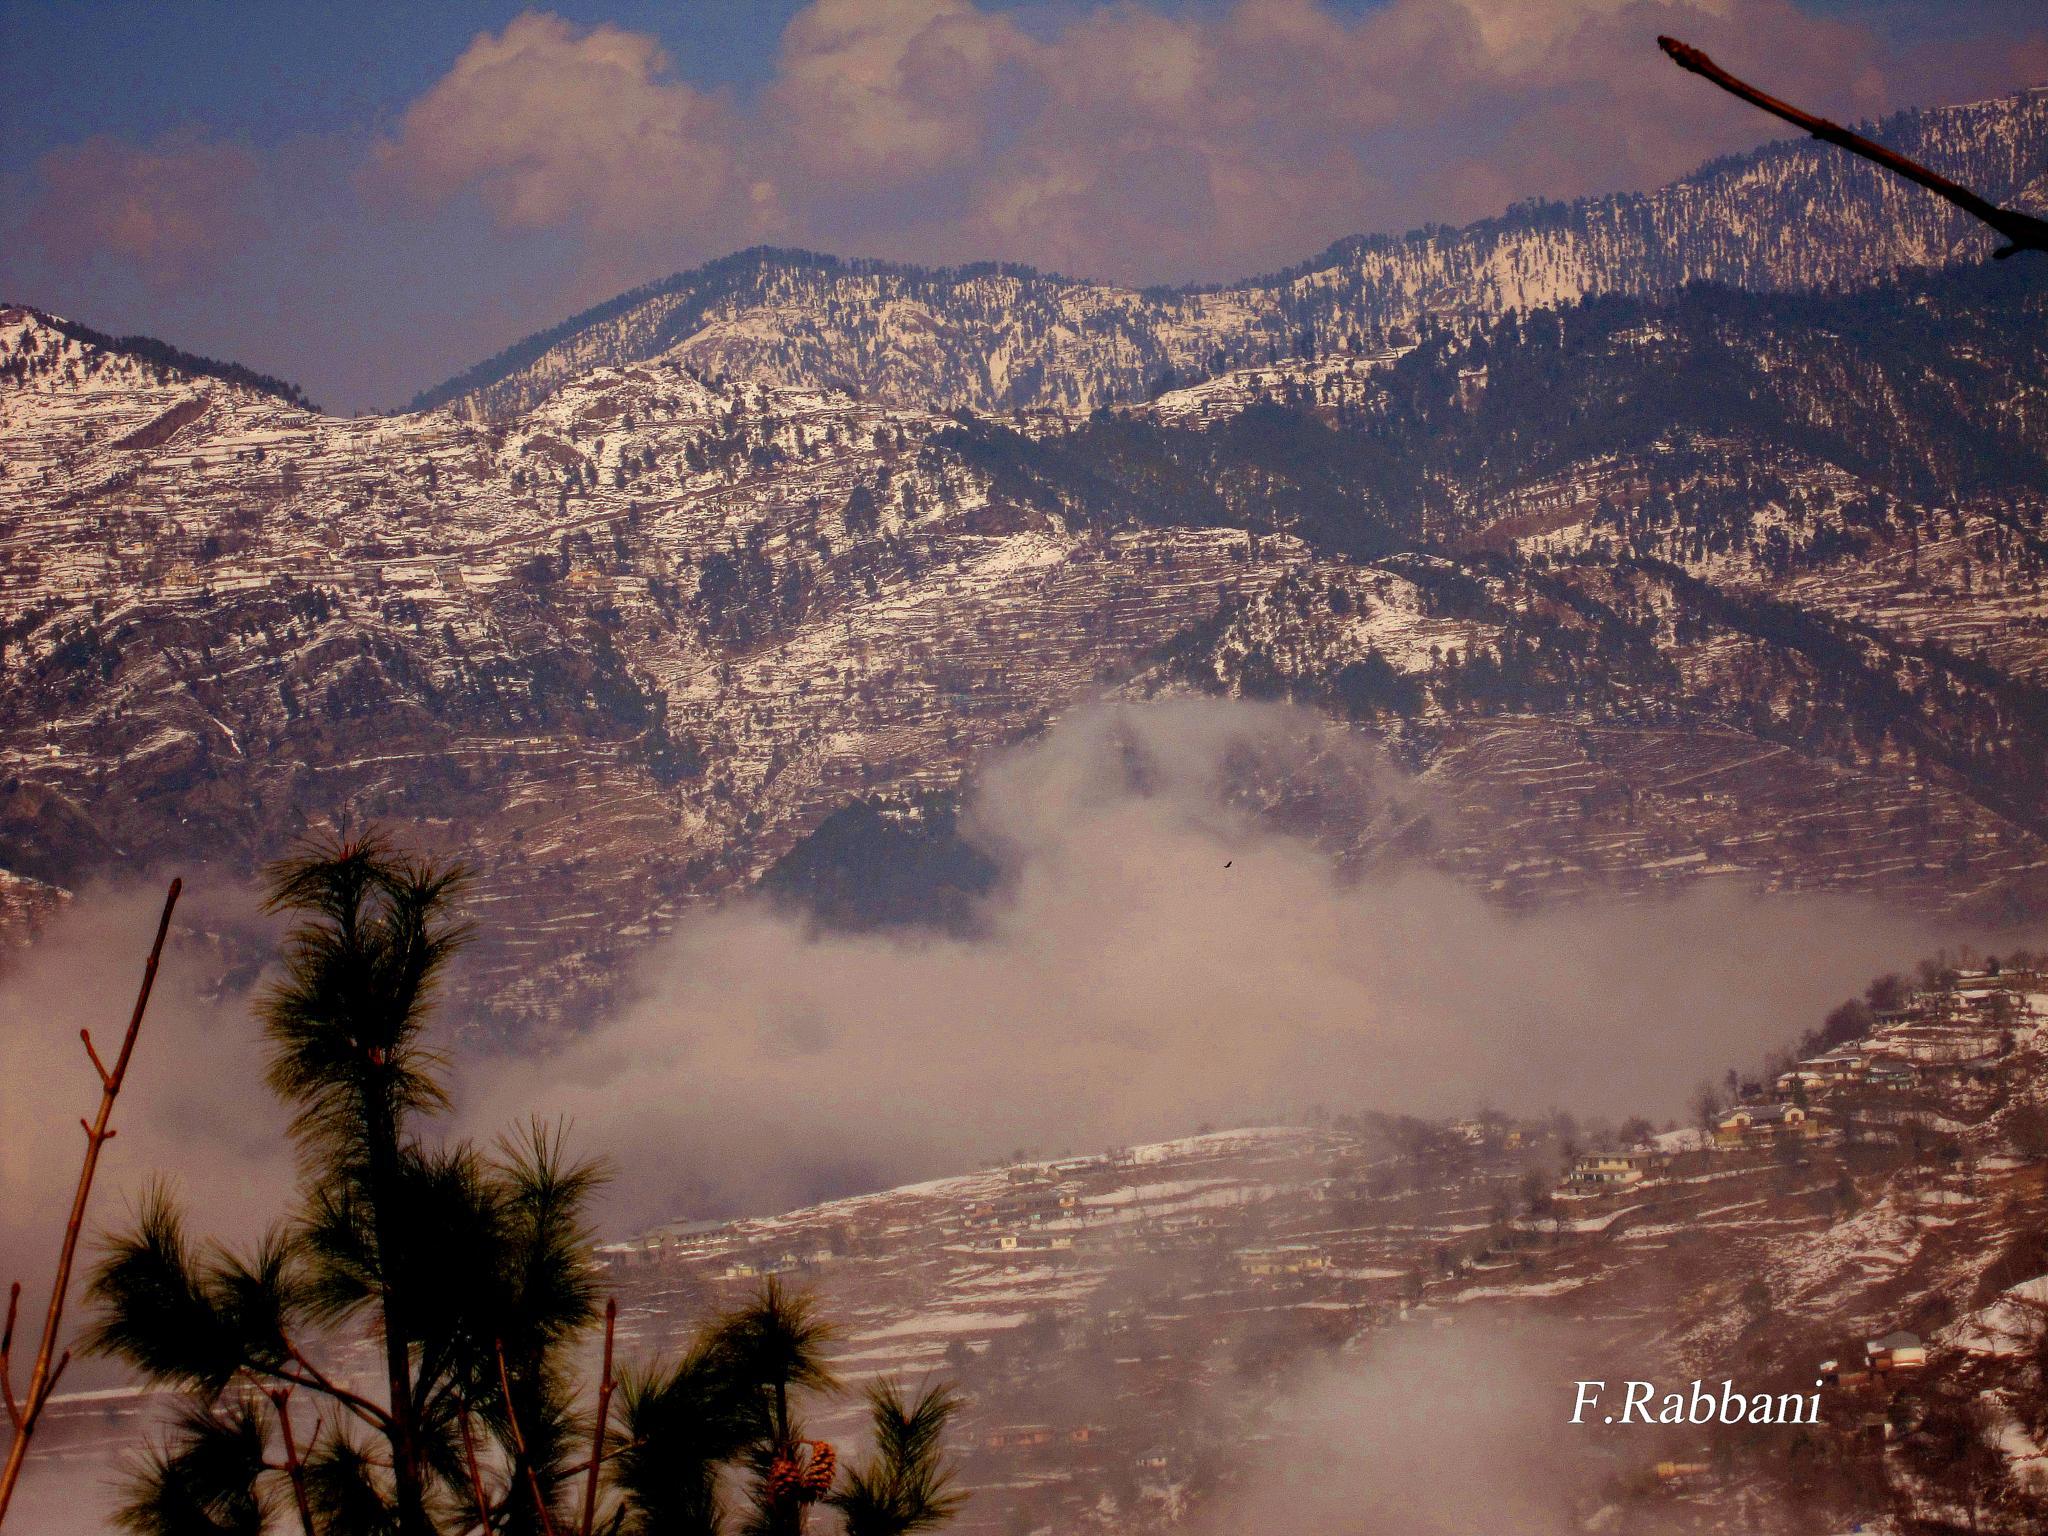 Untitled by Pak Heavens